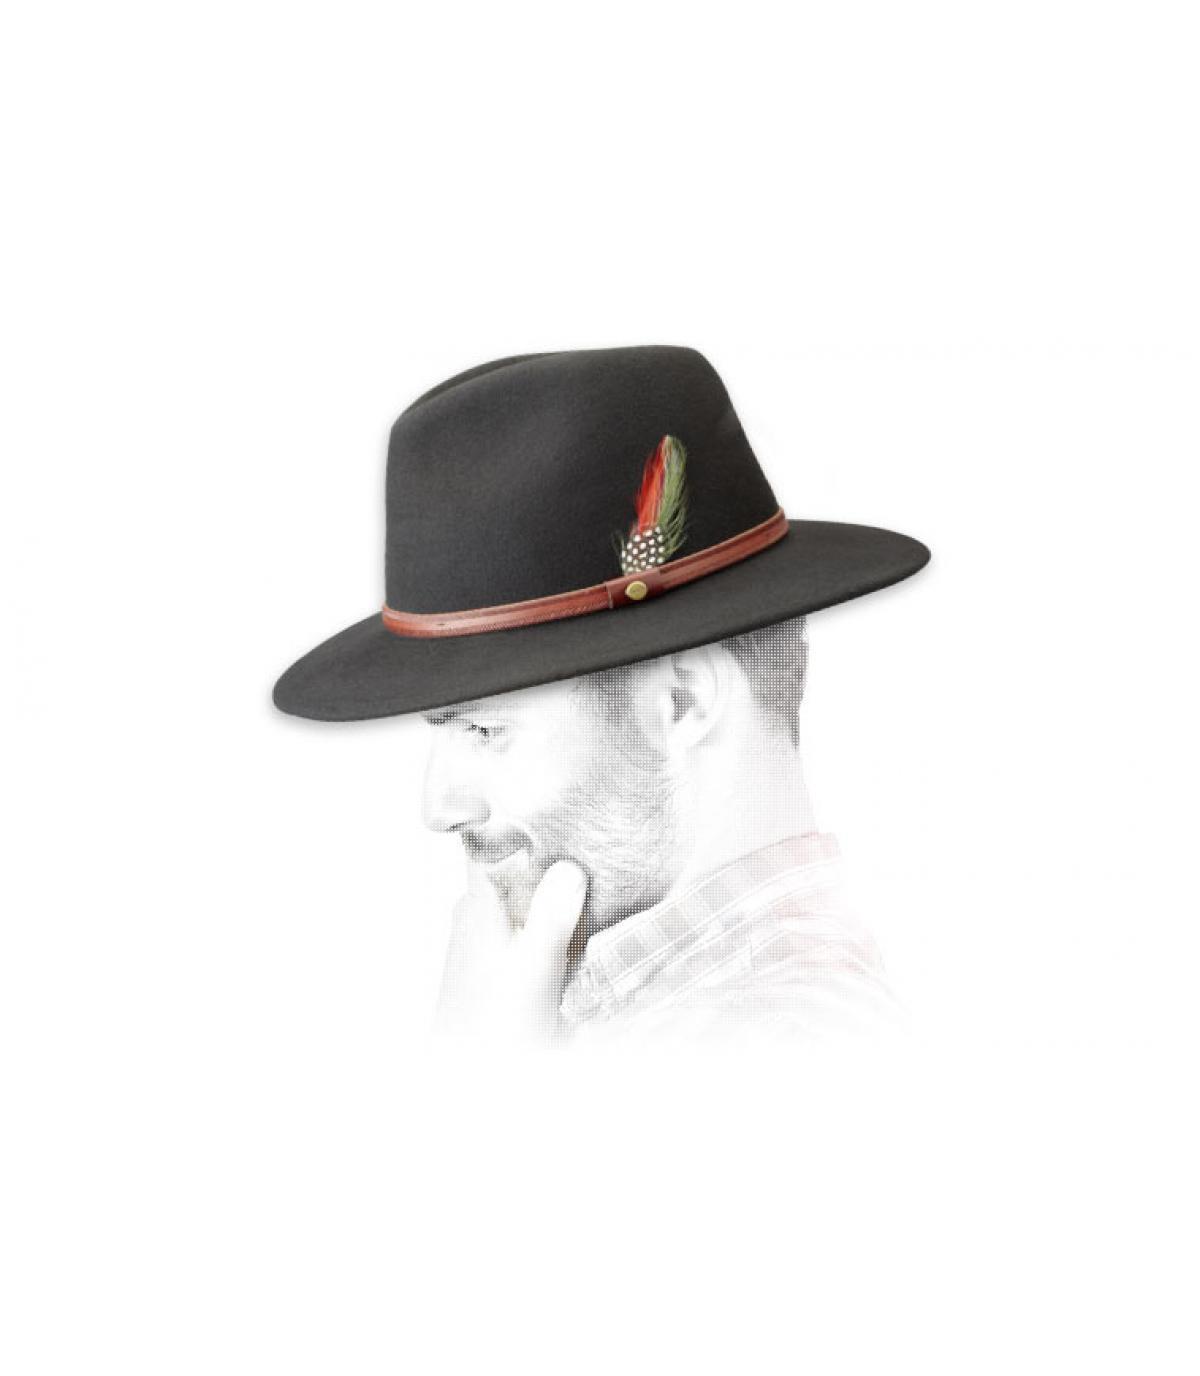 Olive Stetson Hats Rantoul Fedora Hat